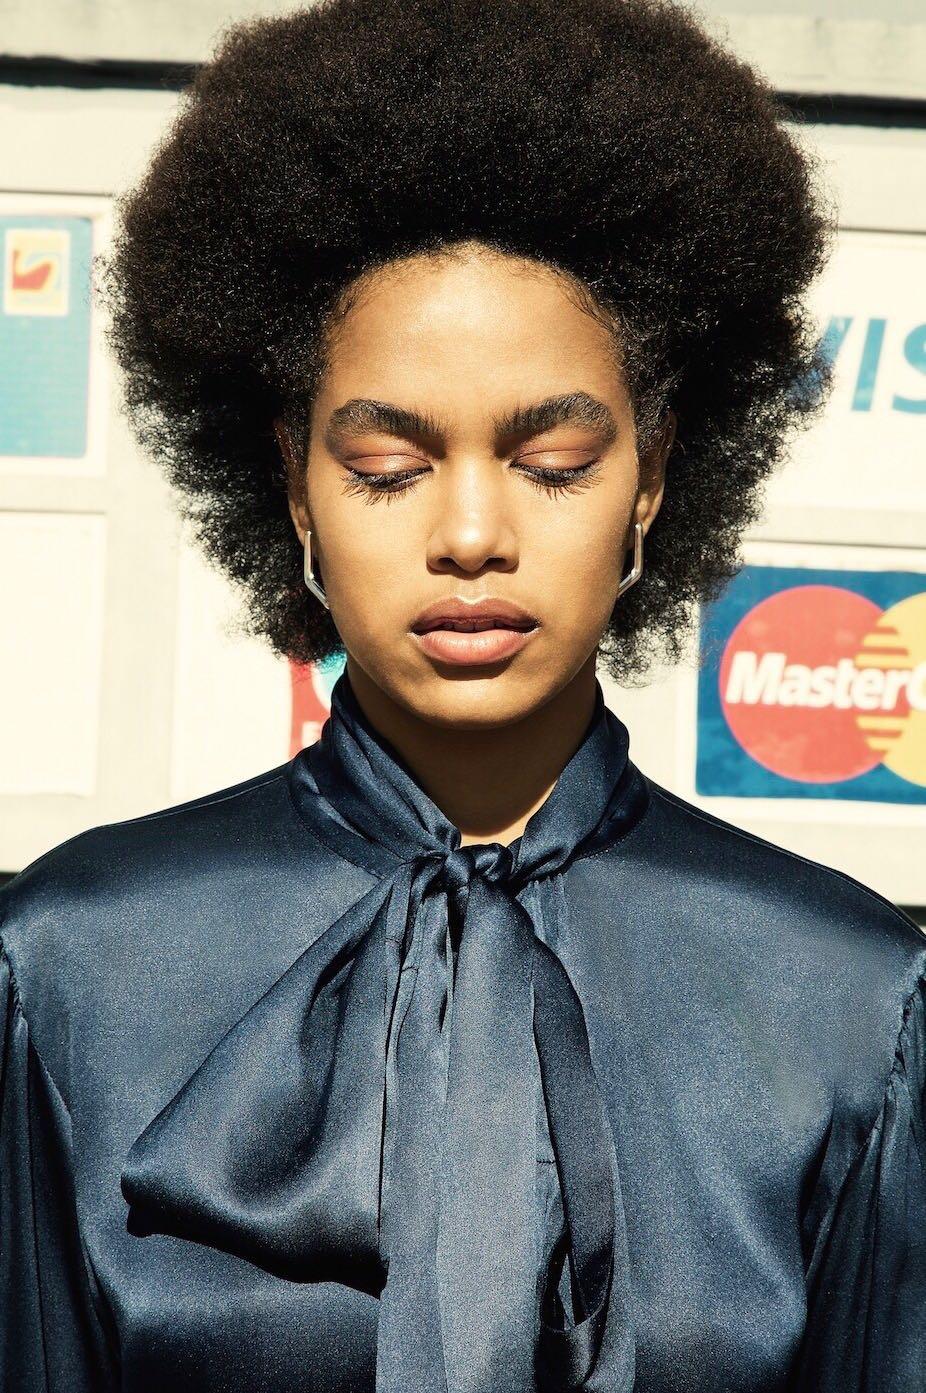 VINTAGE PIERRE  BALMAIN  TOP Image by  H oney Gueco via  Cool UK Mag azine